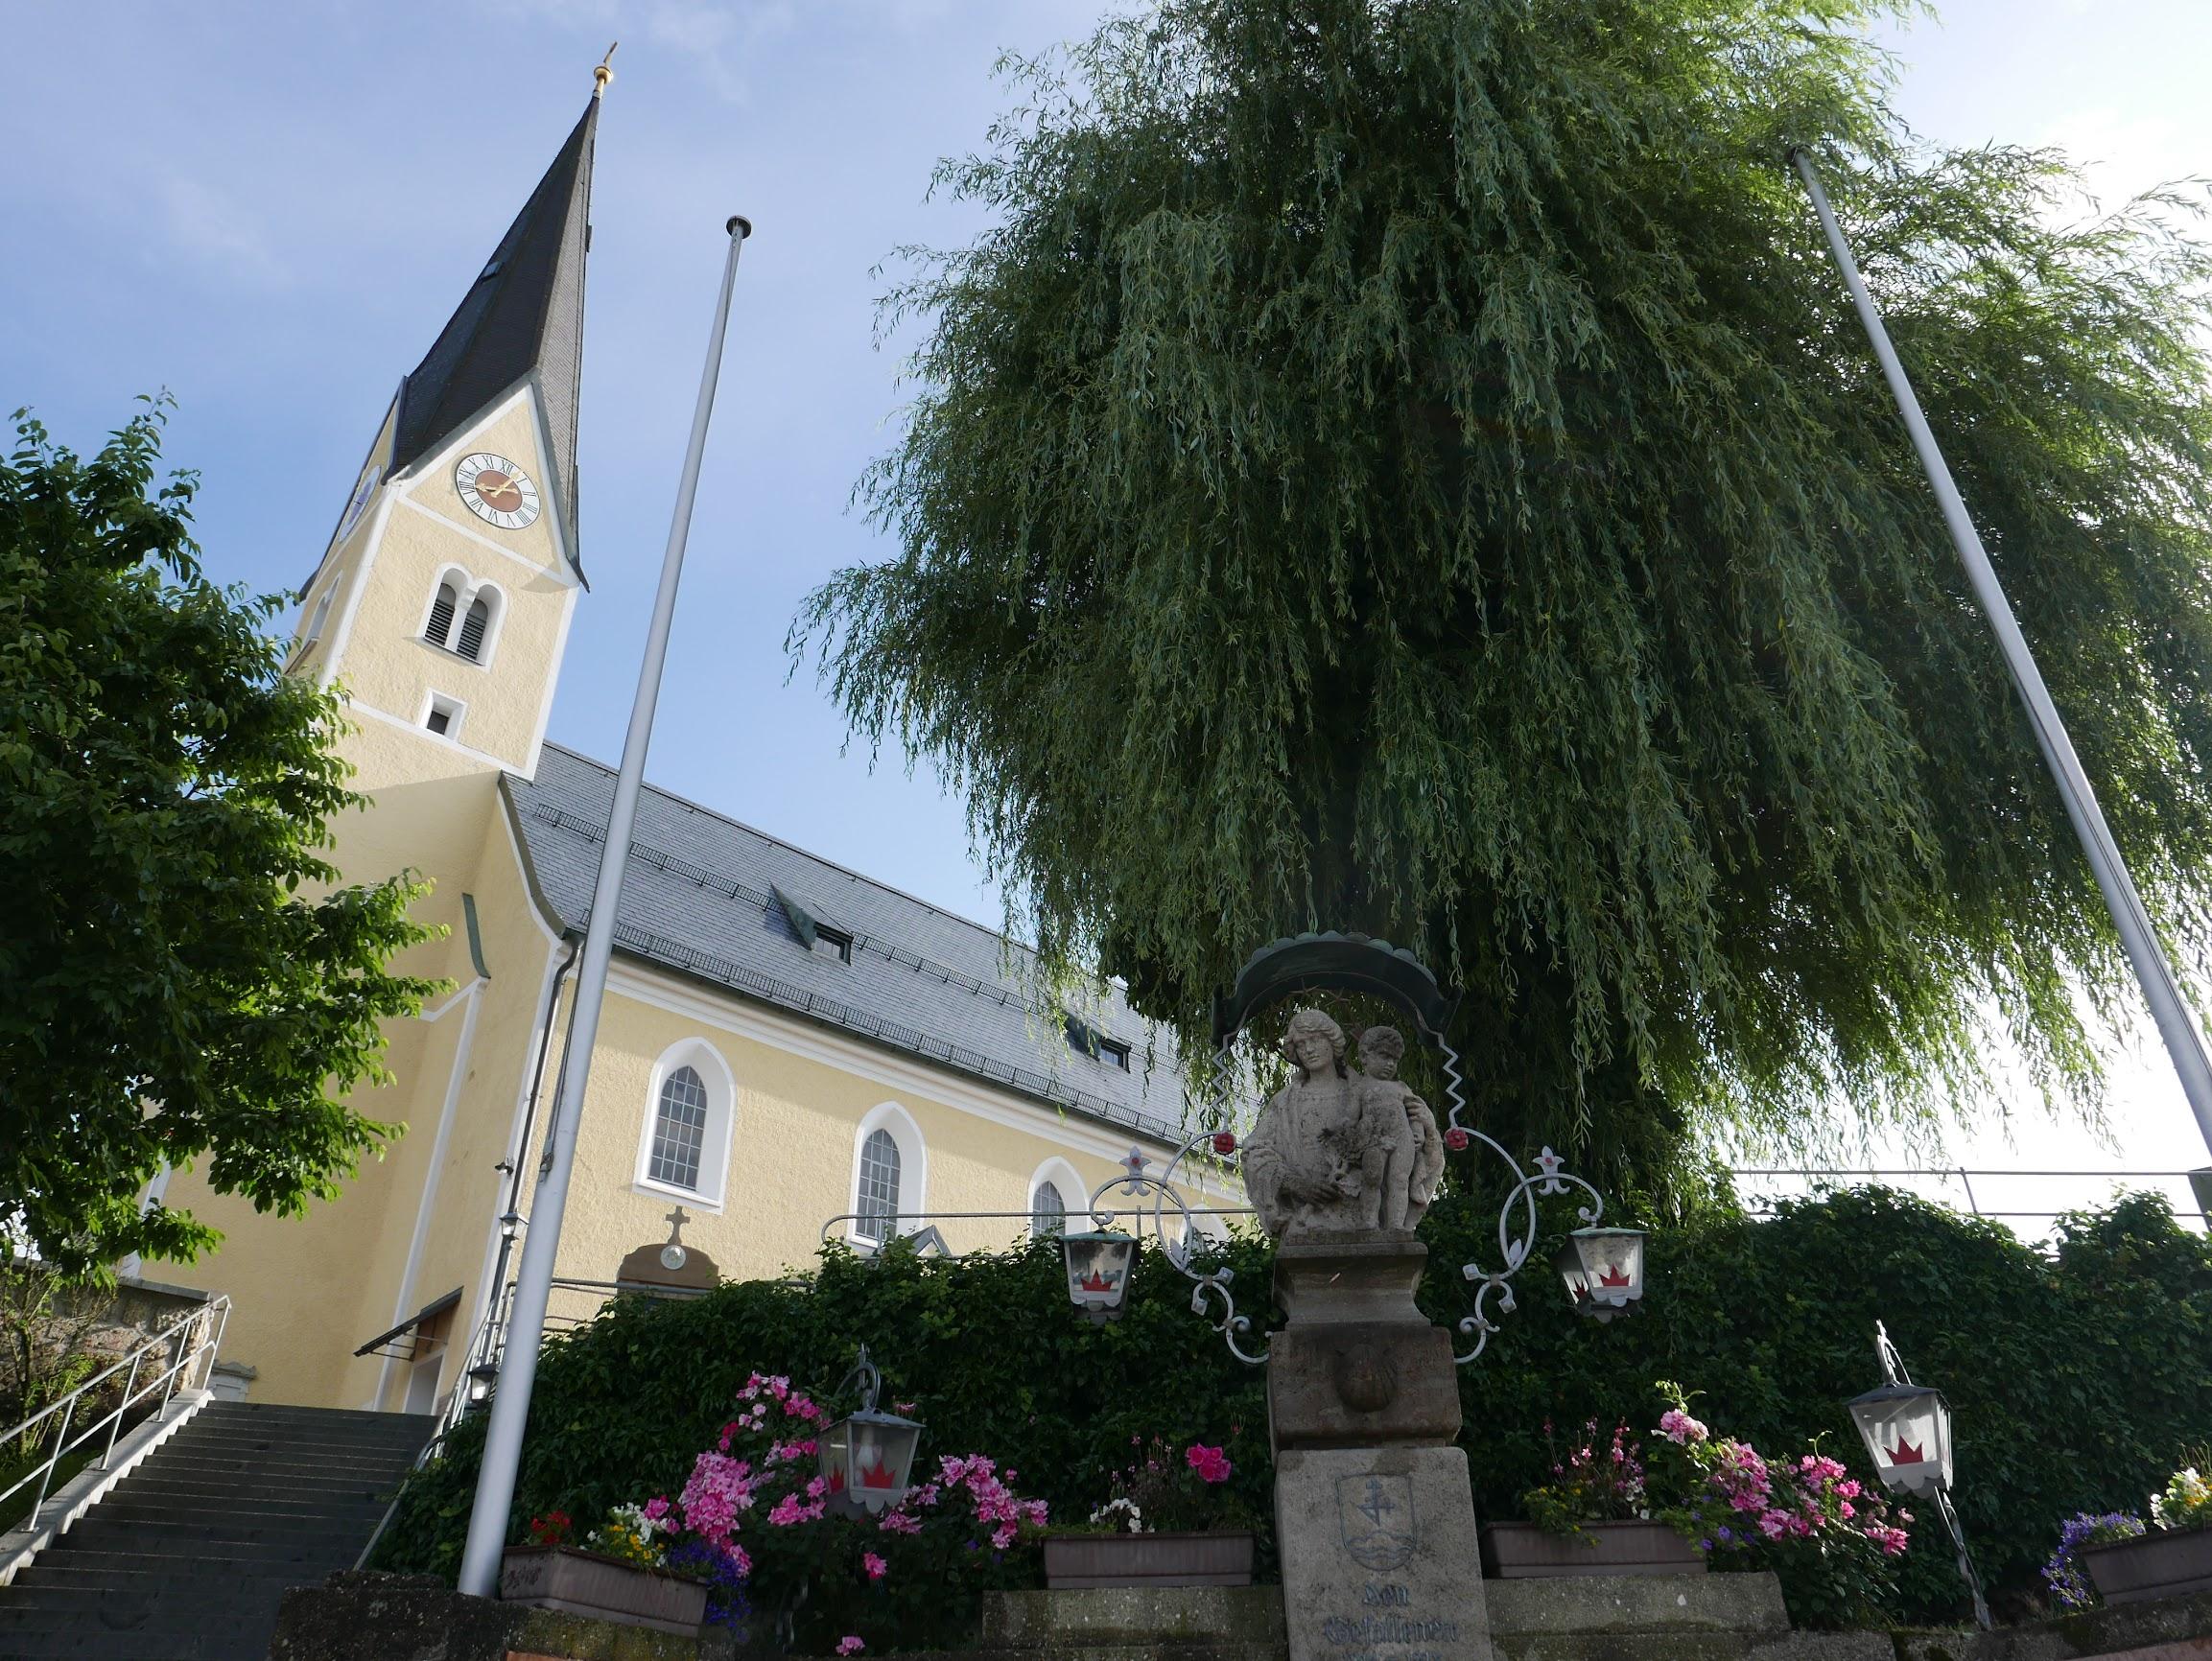 Pfarrkirche St. Laurentius, Bernau am Chiemsee